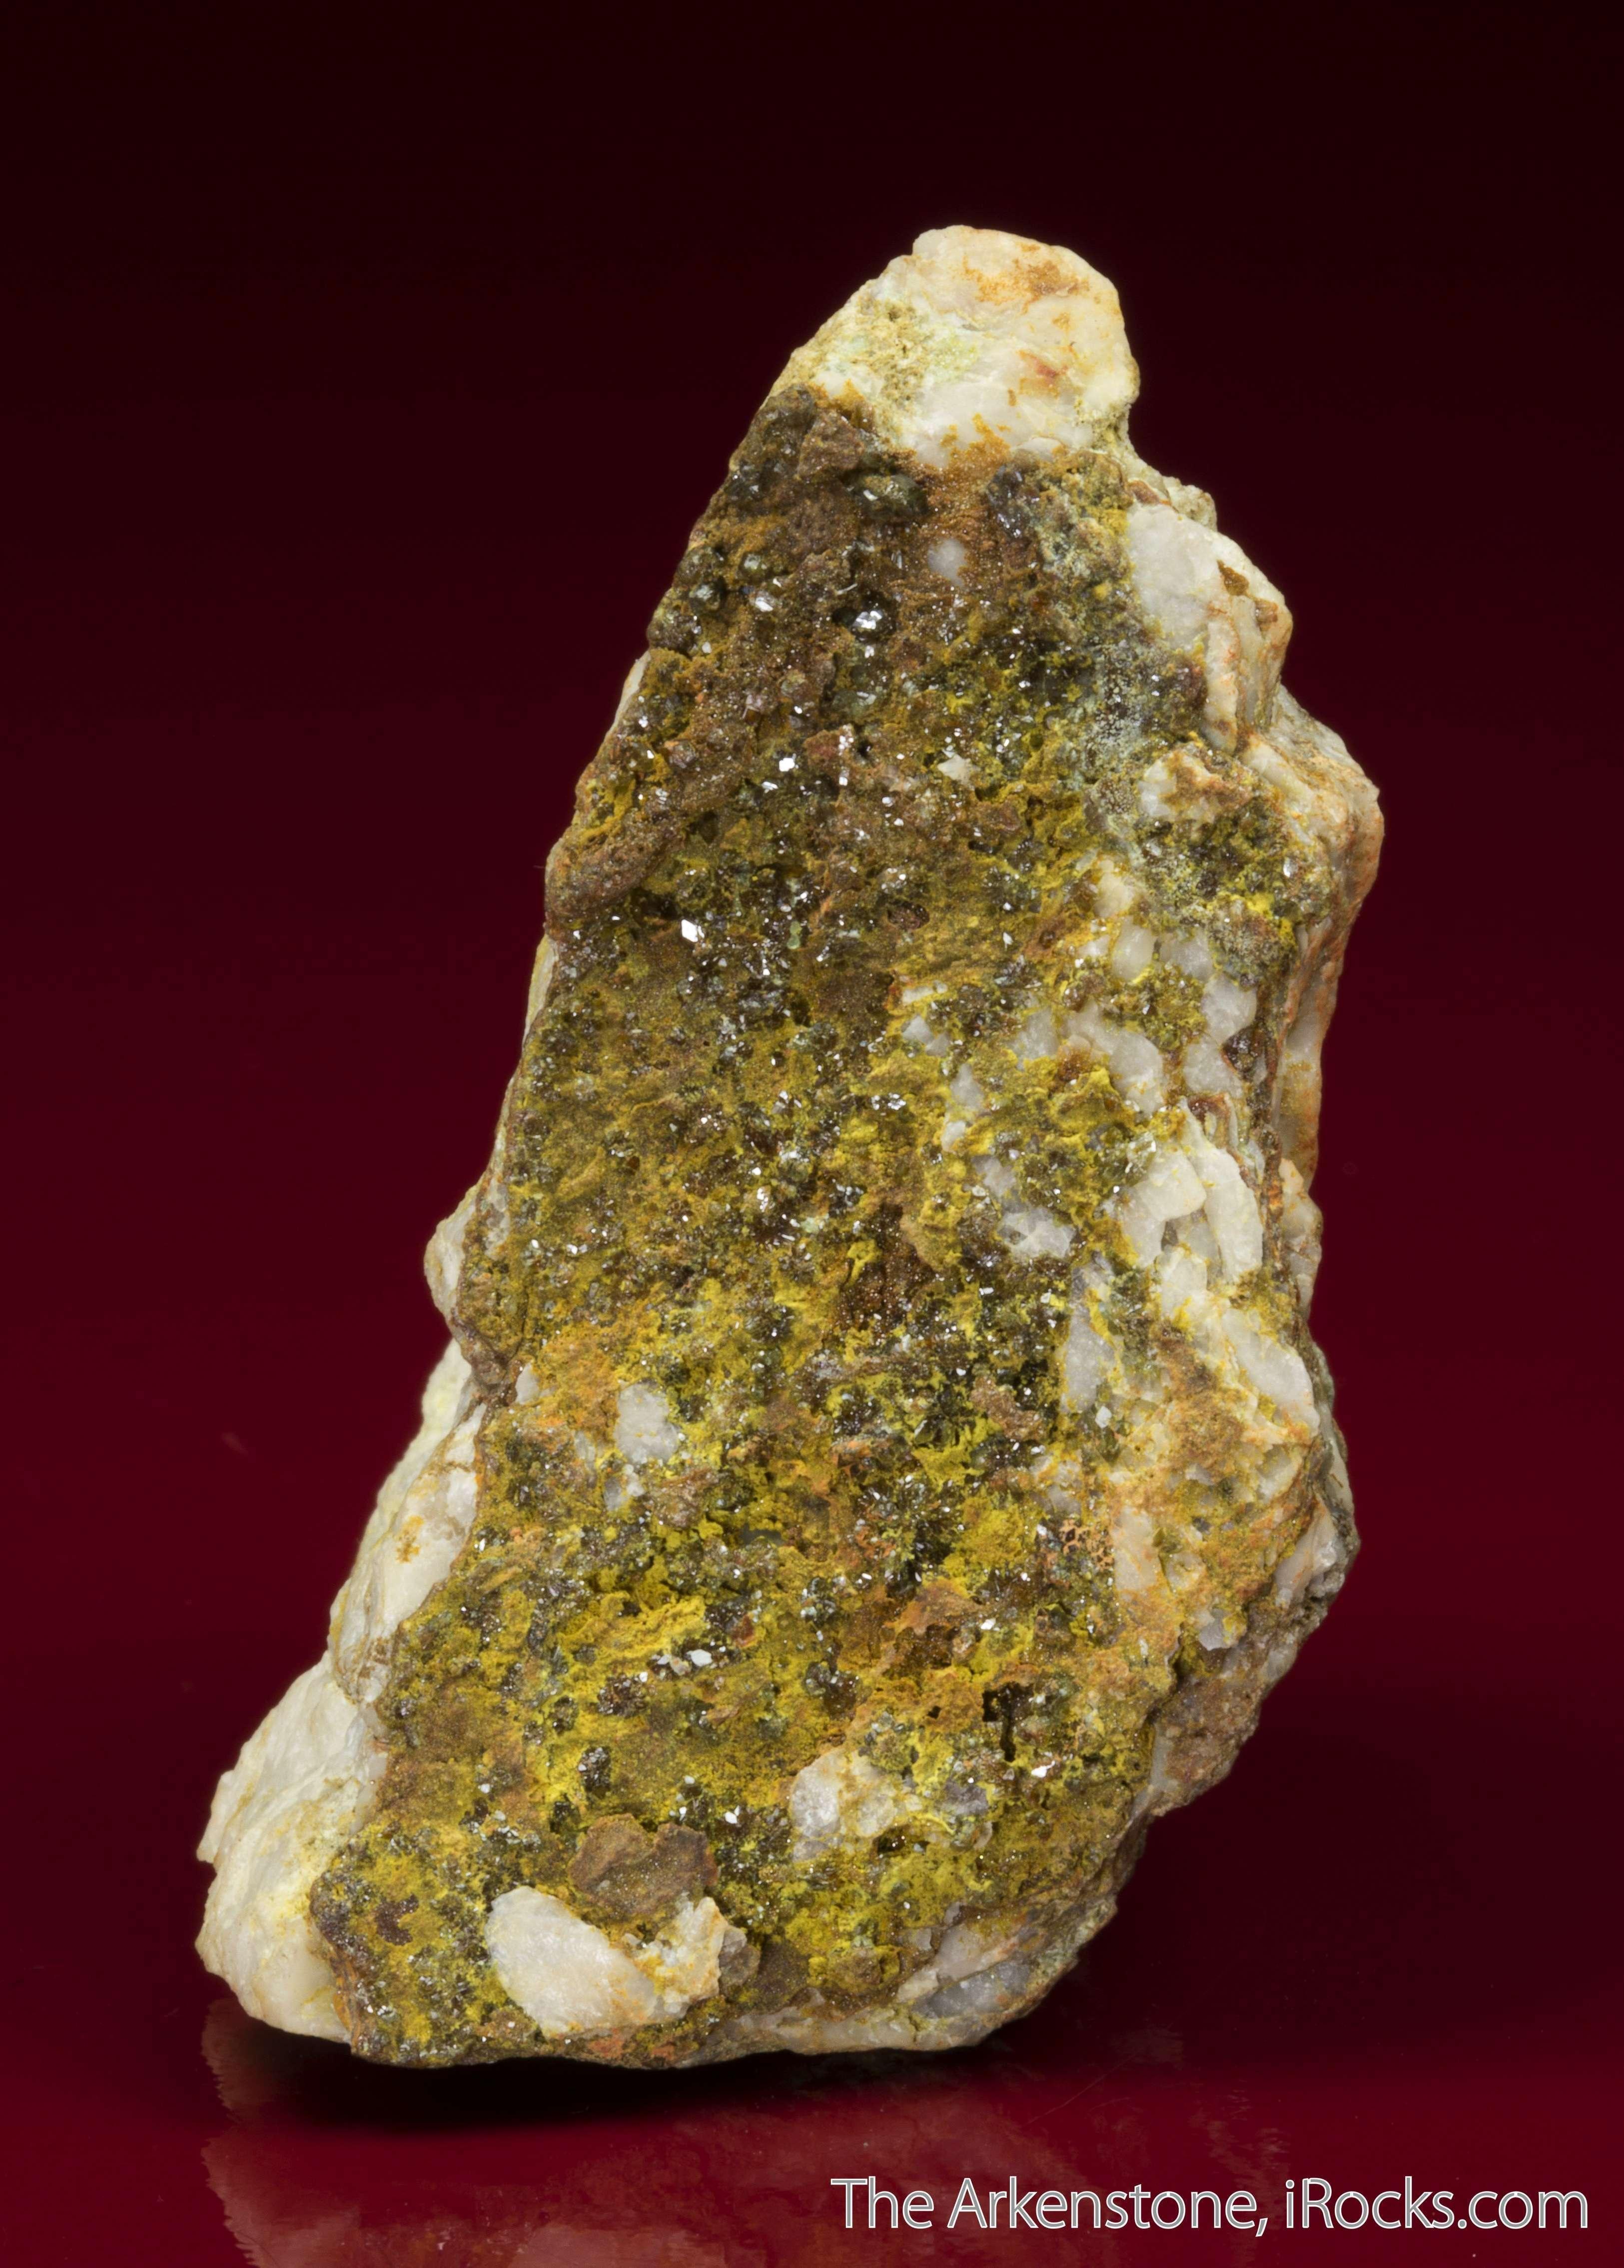 Yellow yellow brown vitreous crystals oxyplumboromeite 1mm densely